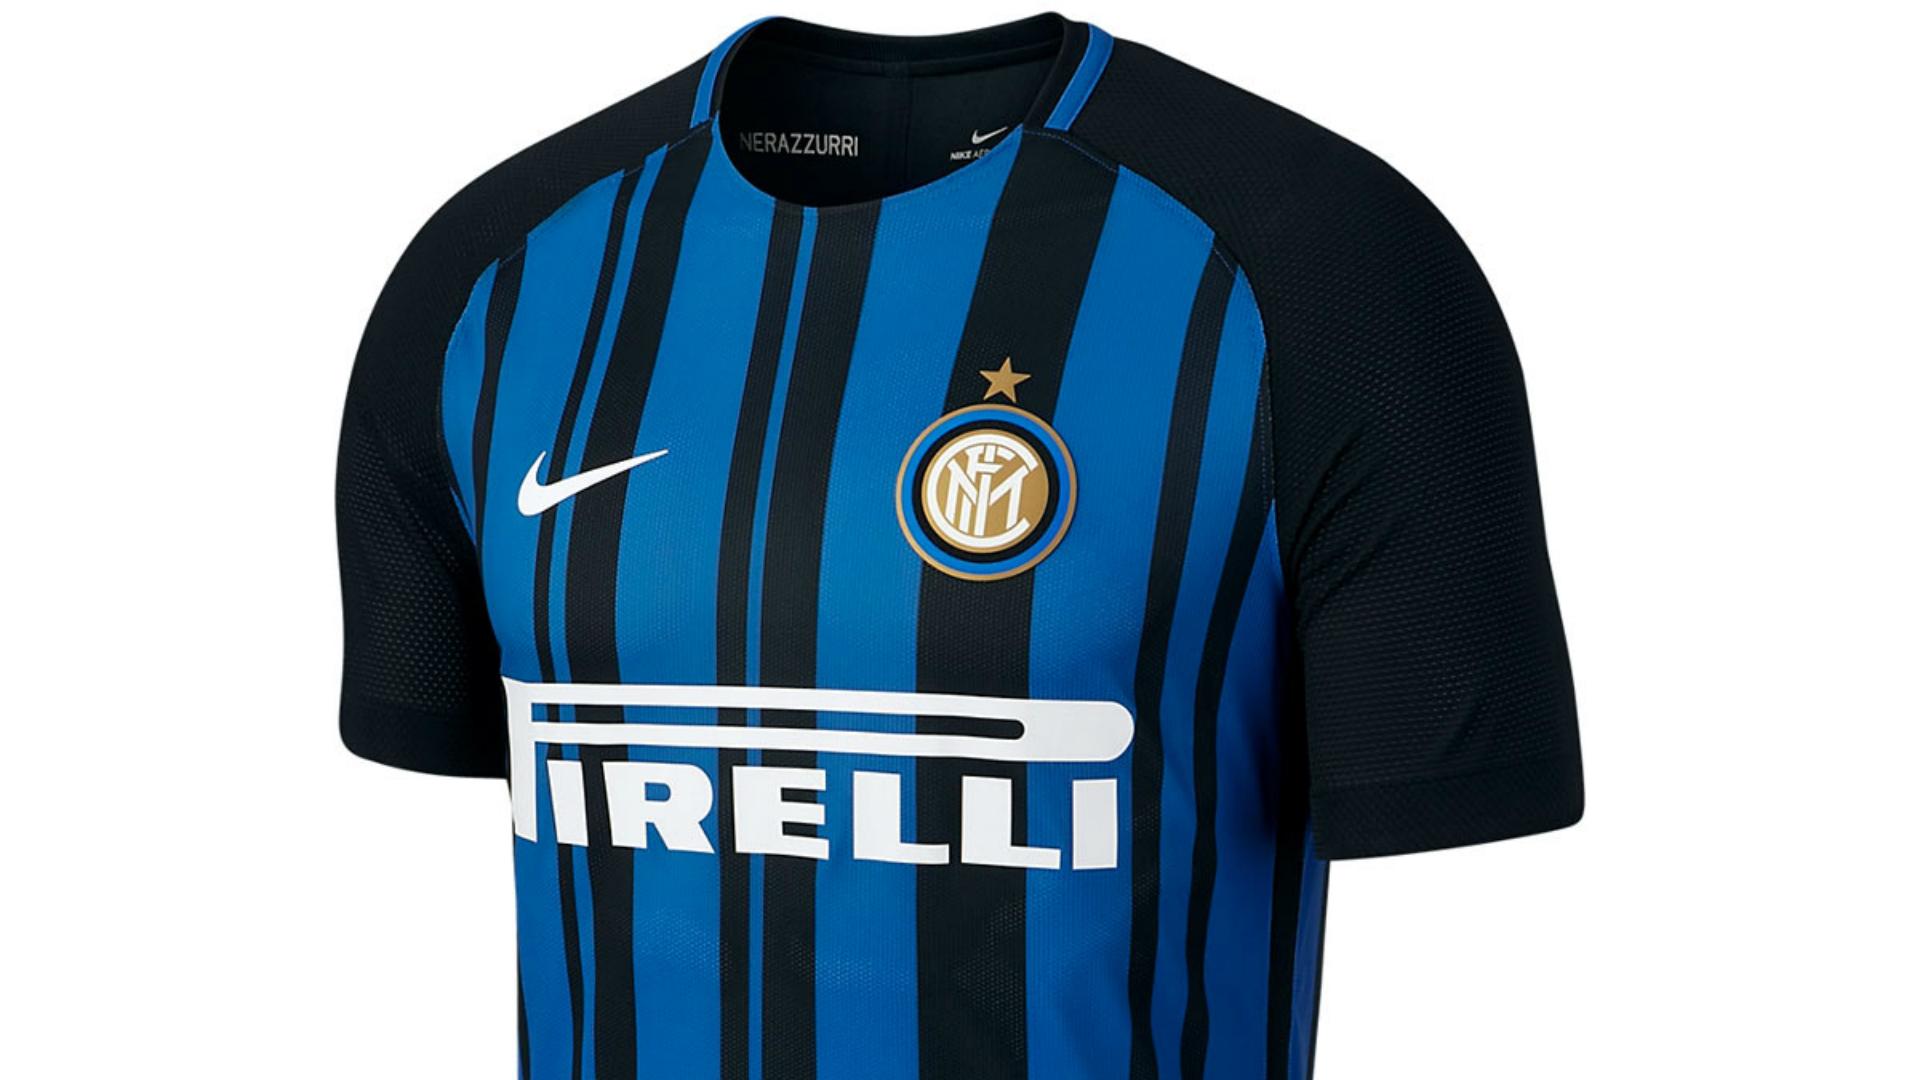 Maillot Inter Milan 2017-2018 home domicile